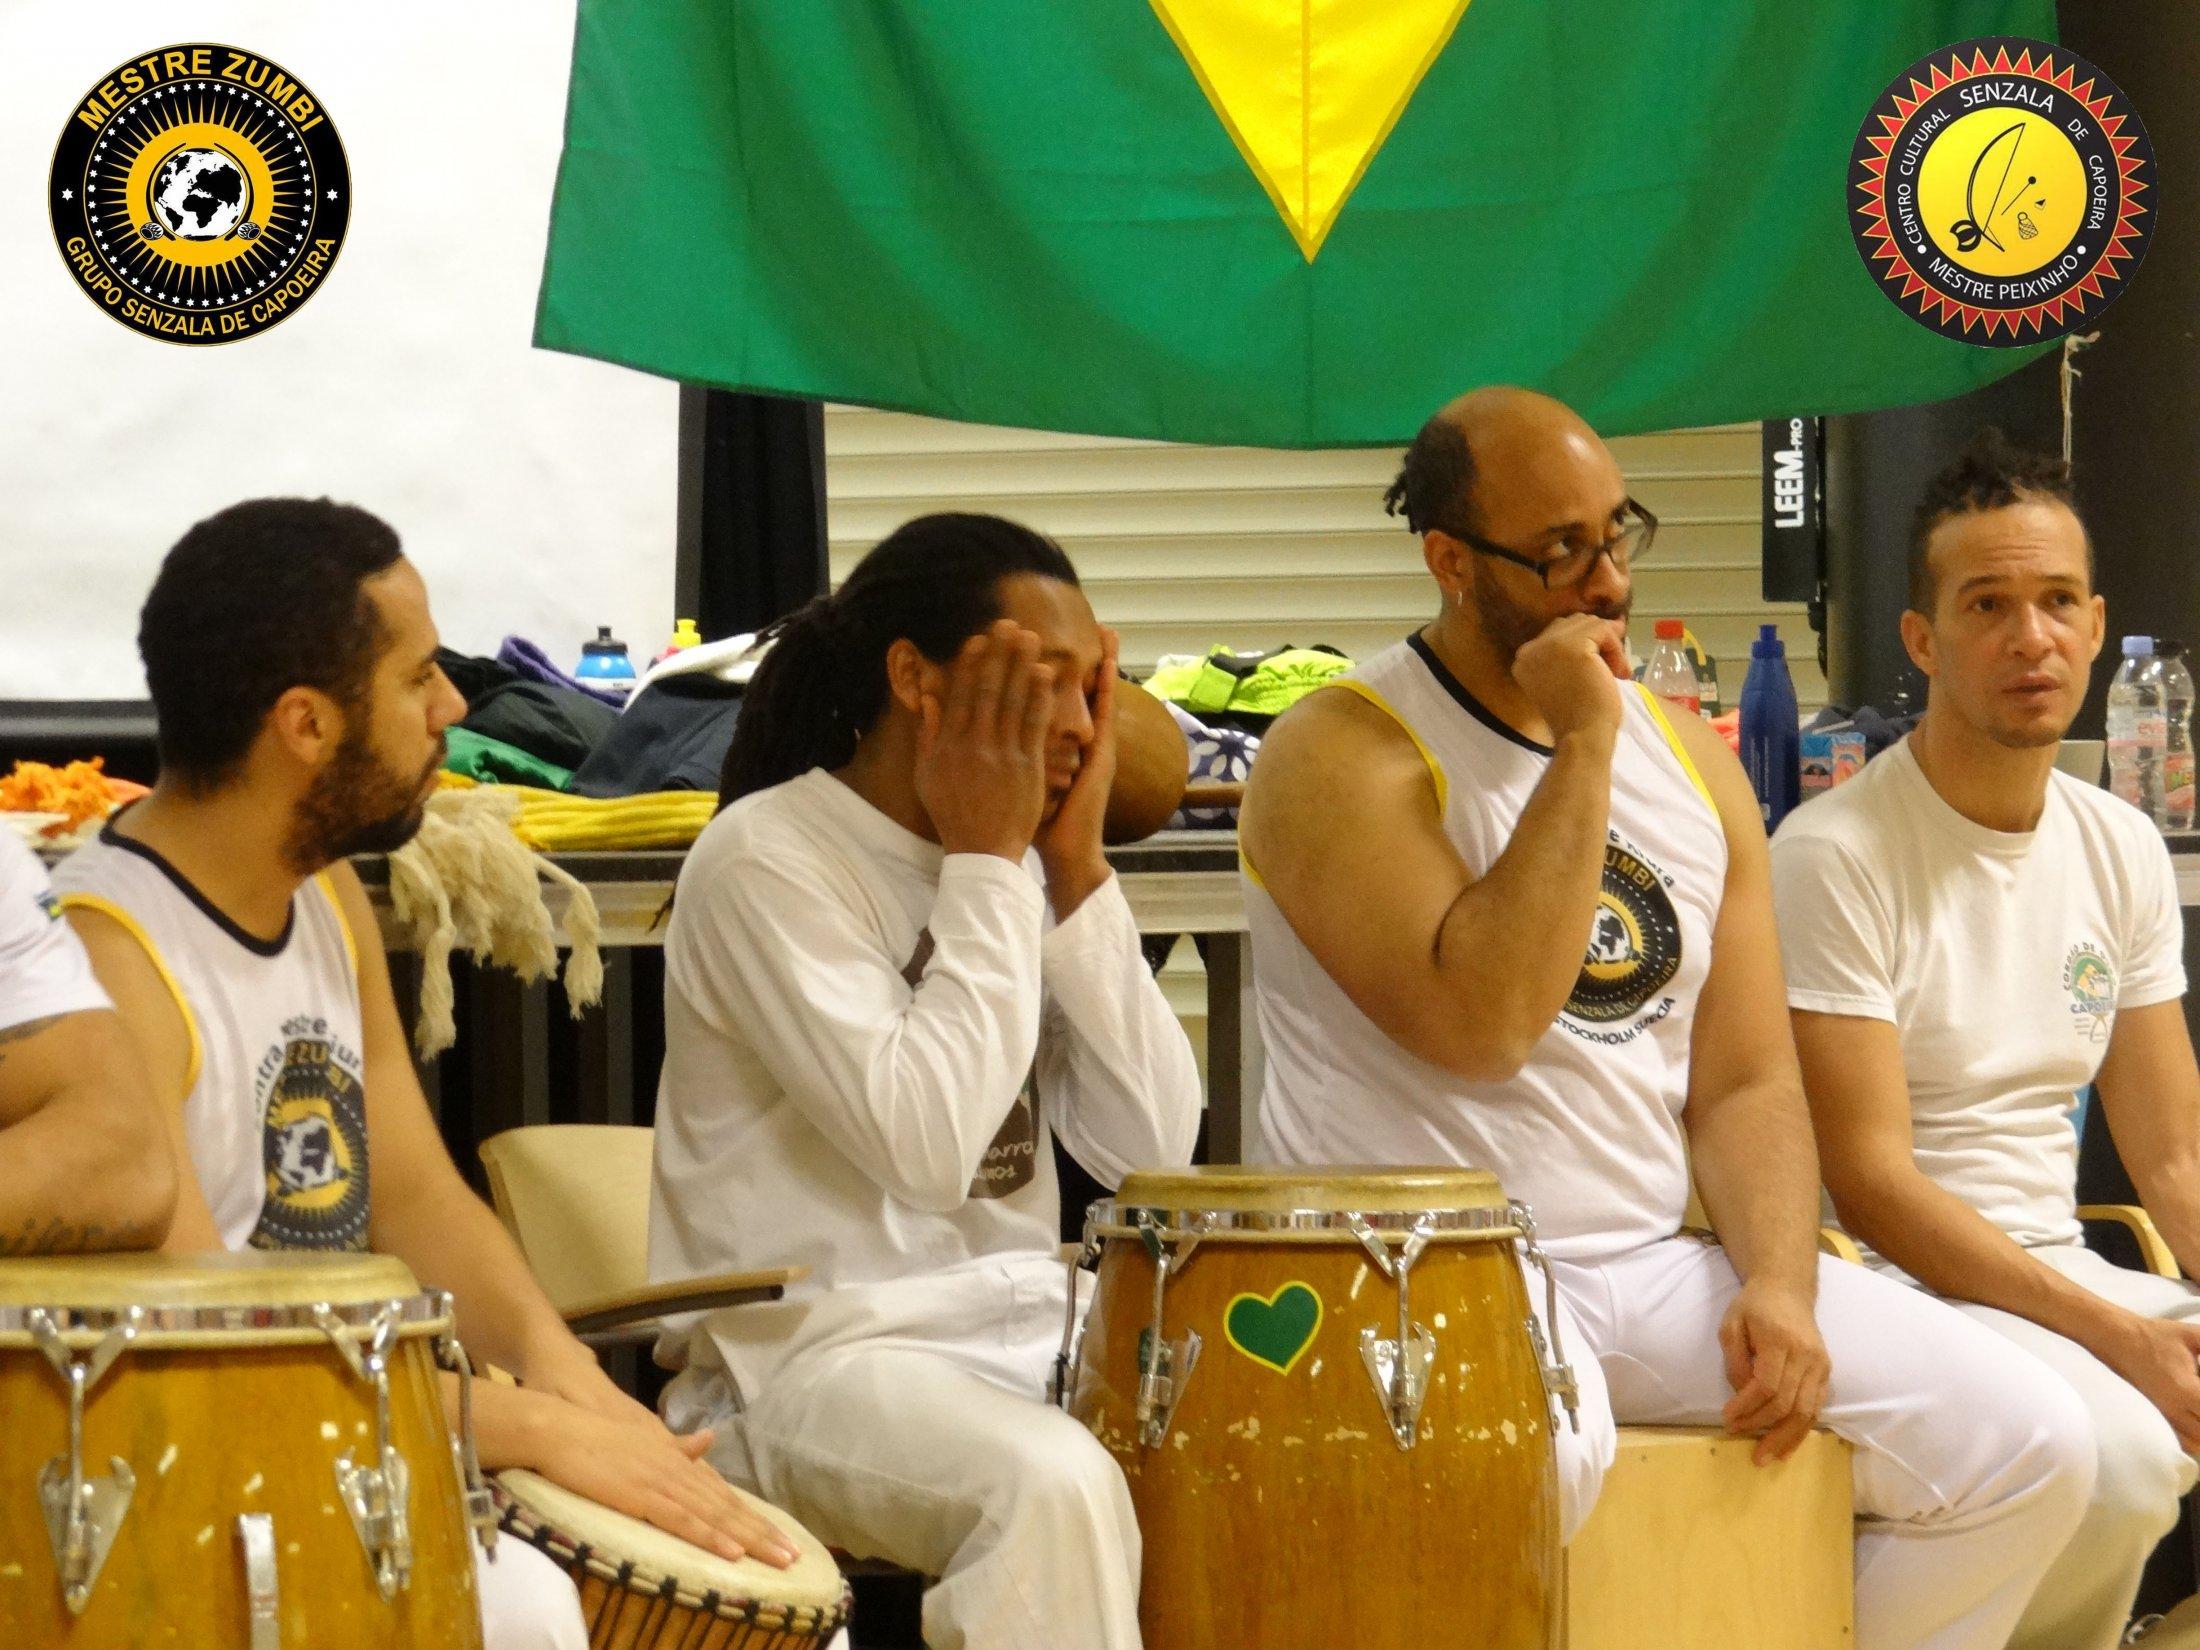 2013-12-14 - Capoeira 043